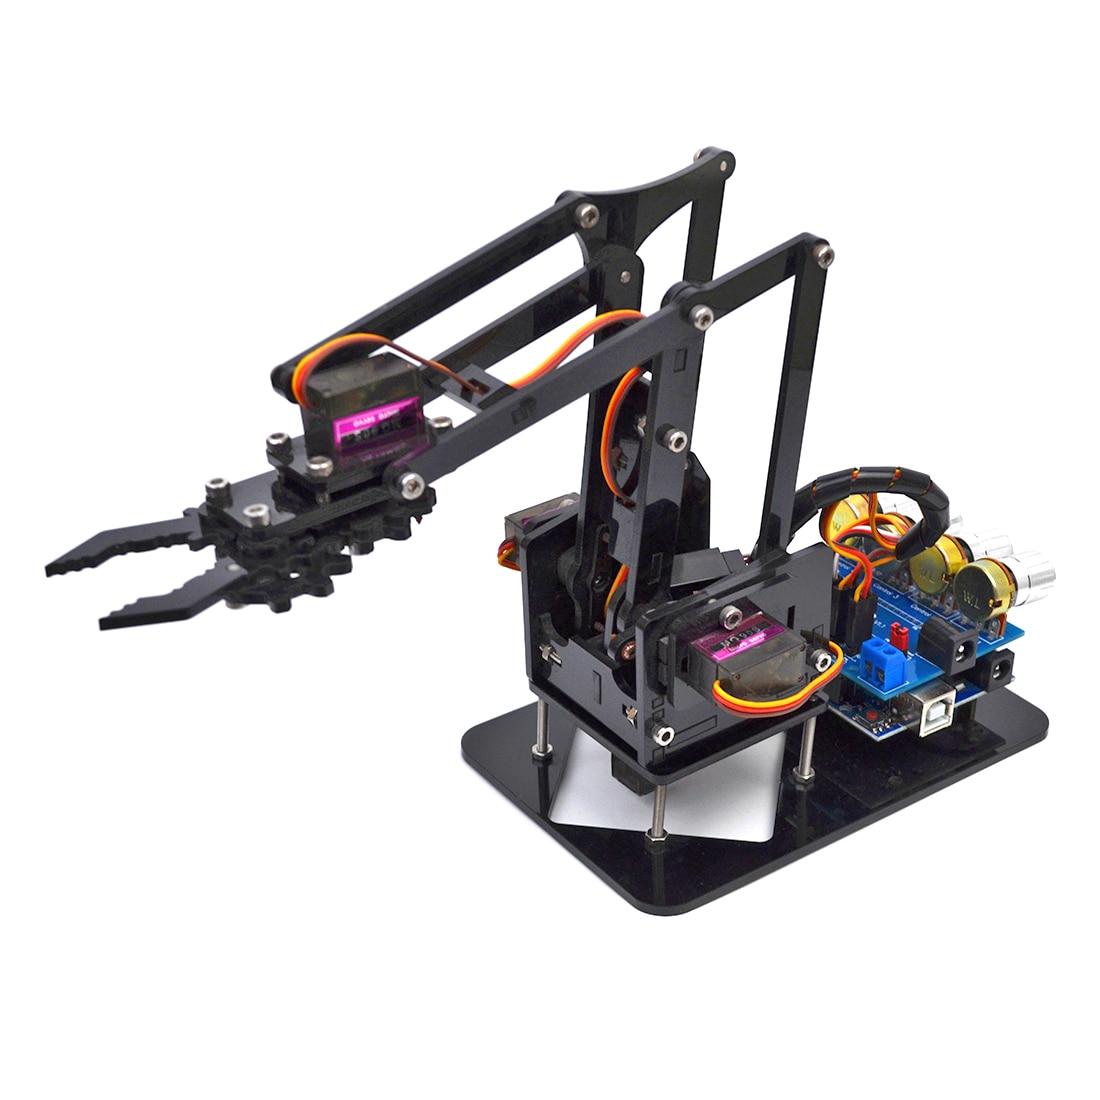 DIY Acrylic Robot Arm Robot Claw For Arduino Kit 4DOF Mechanical Grab Manipulator Programmable Toys